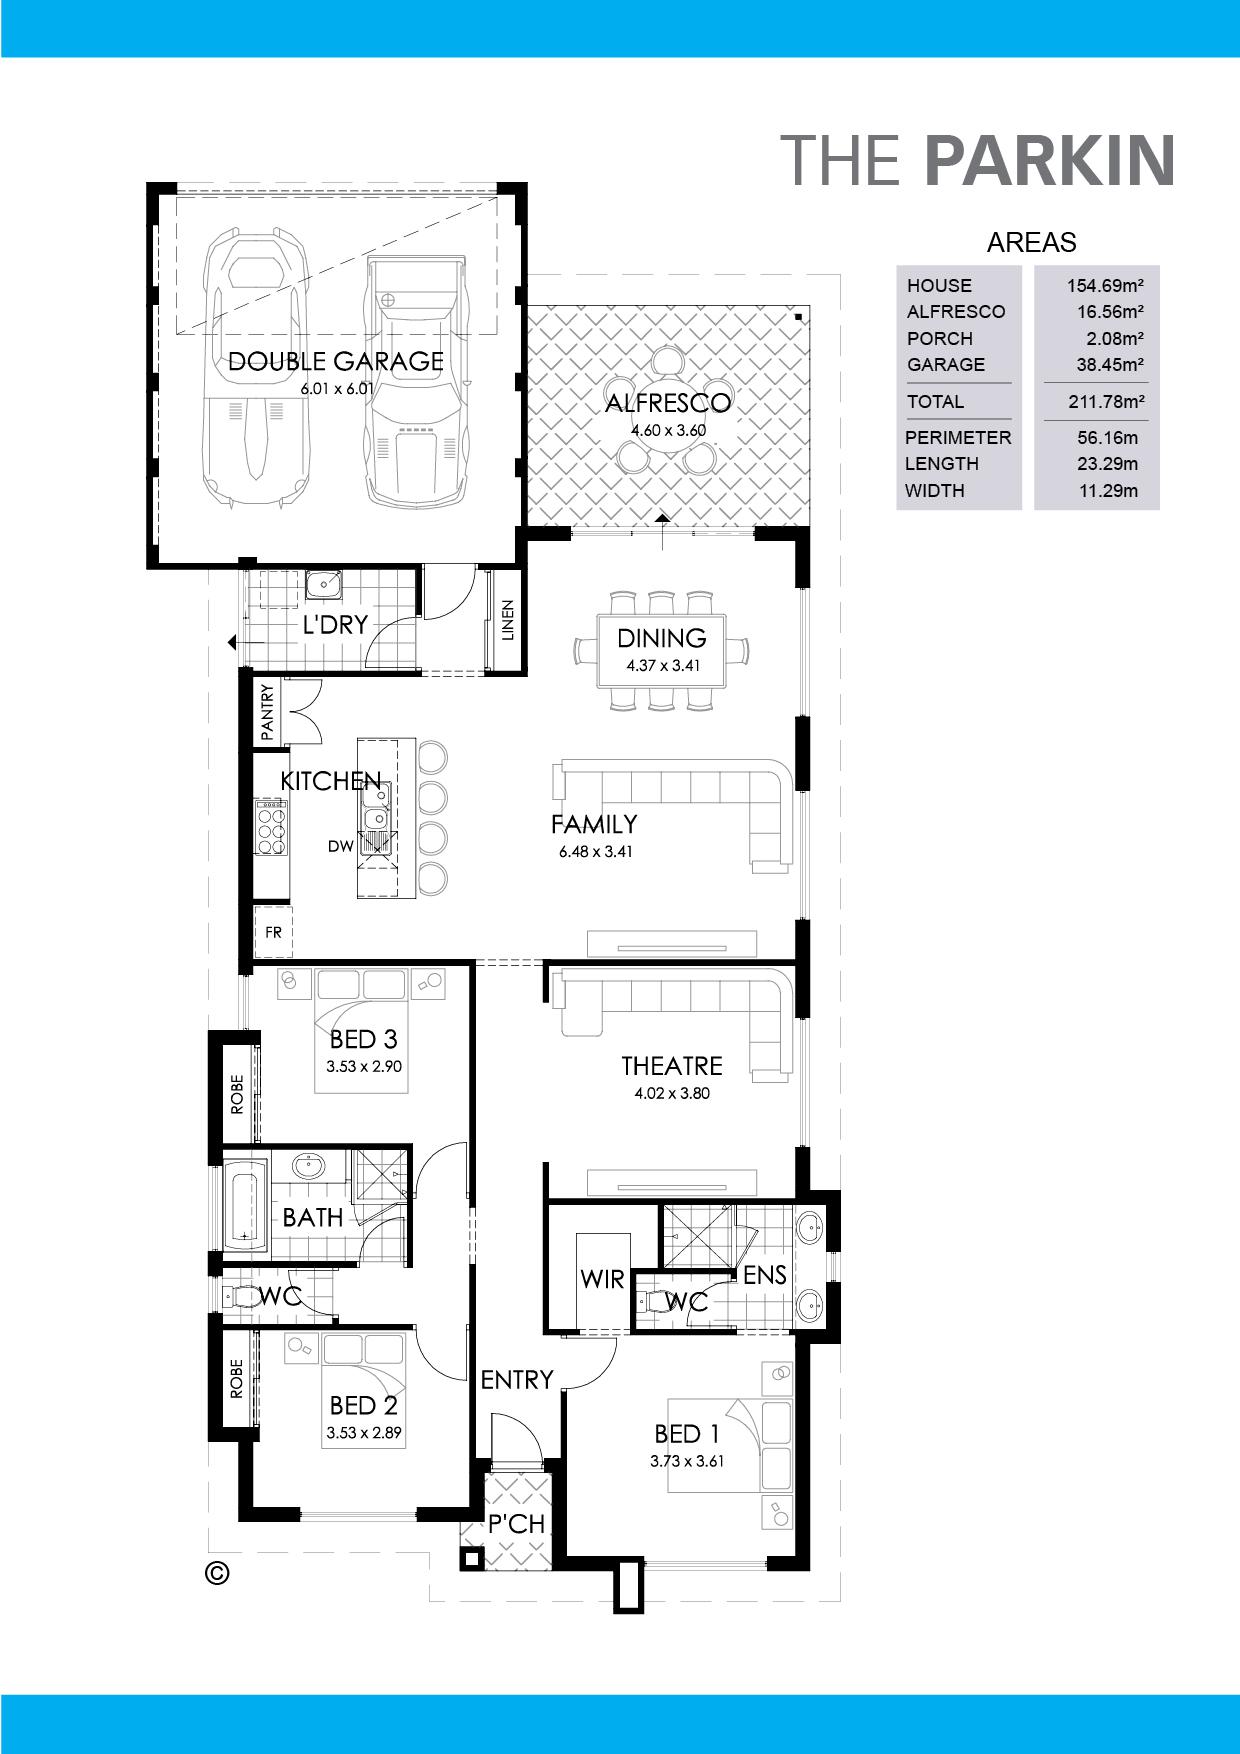 The Parkin Floorplan